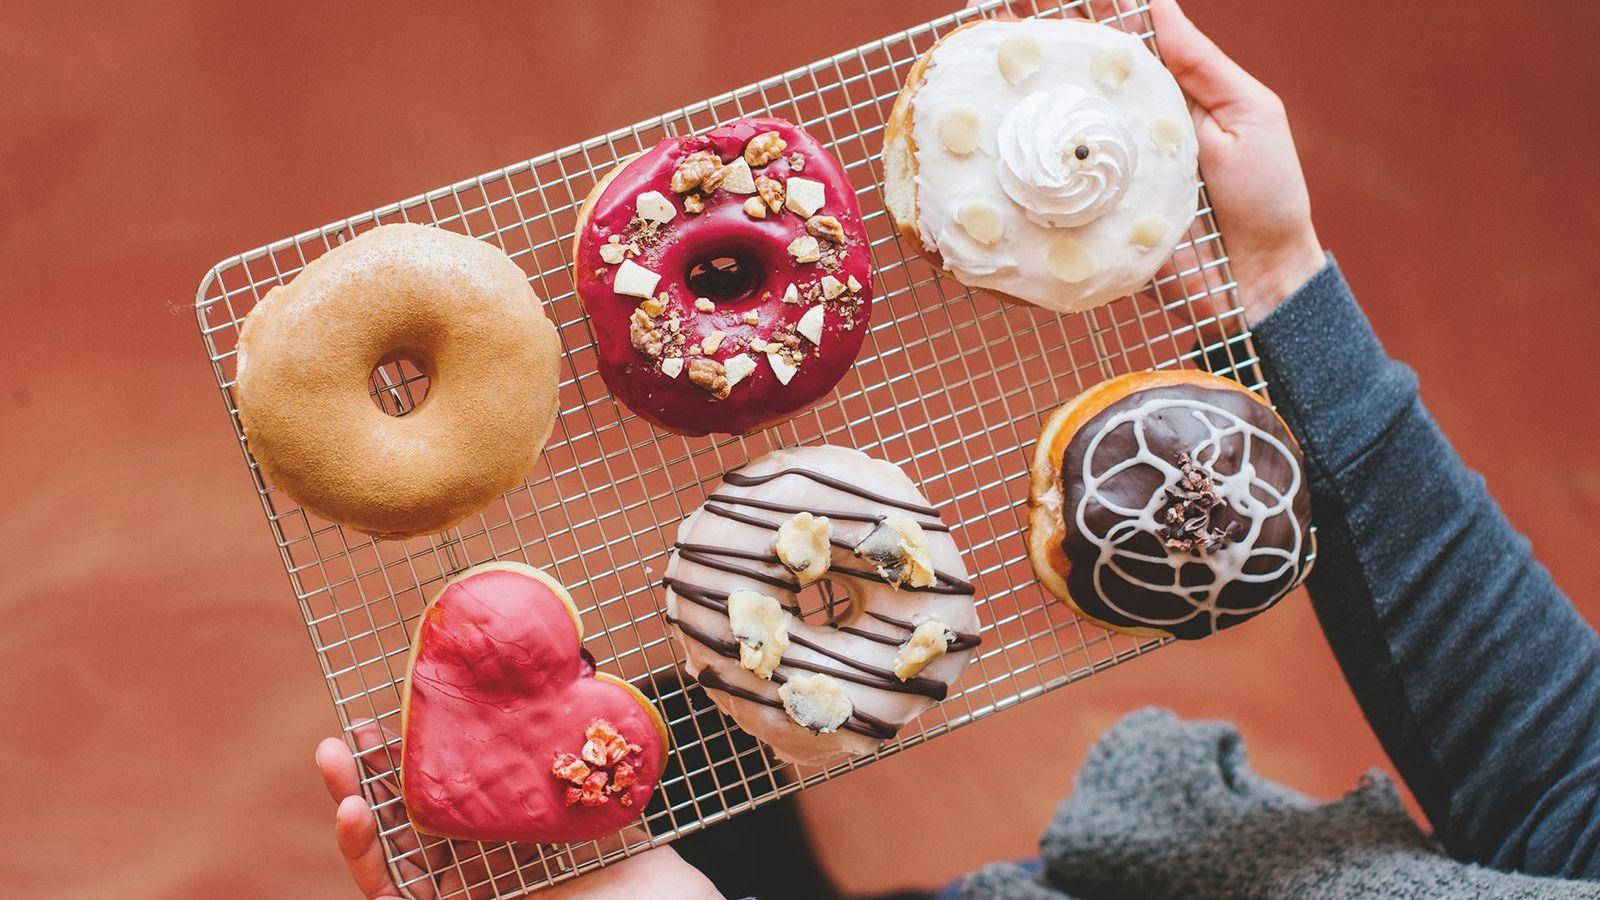 Brammibal's Doughnuts